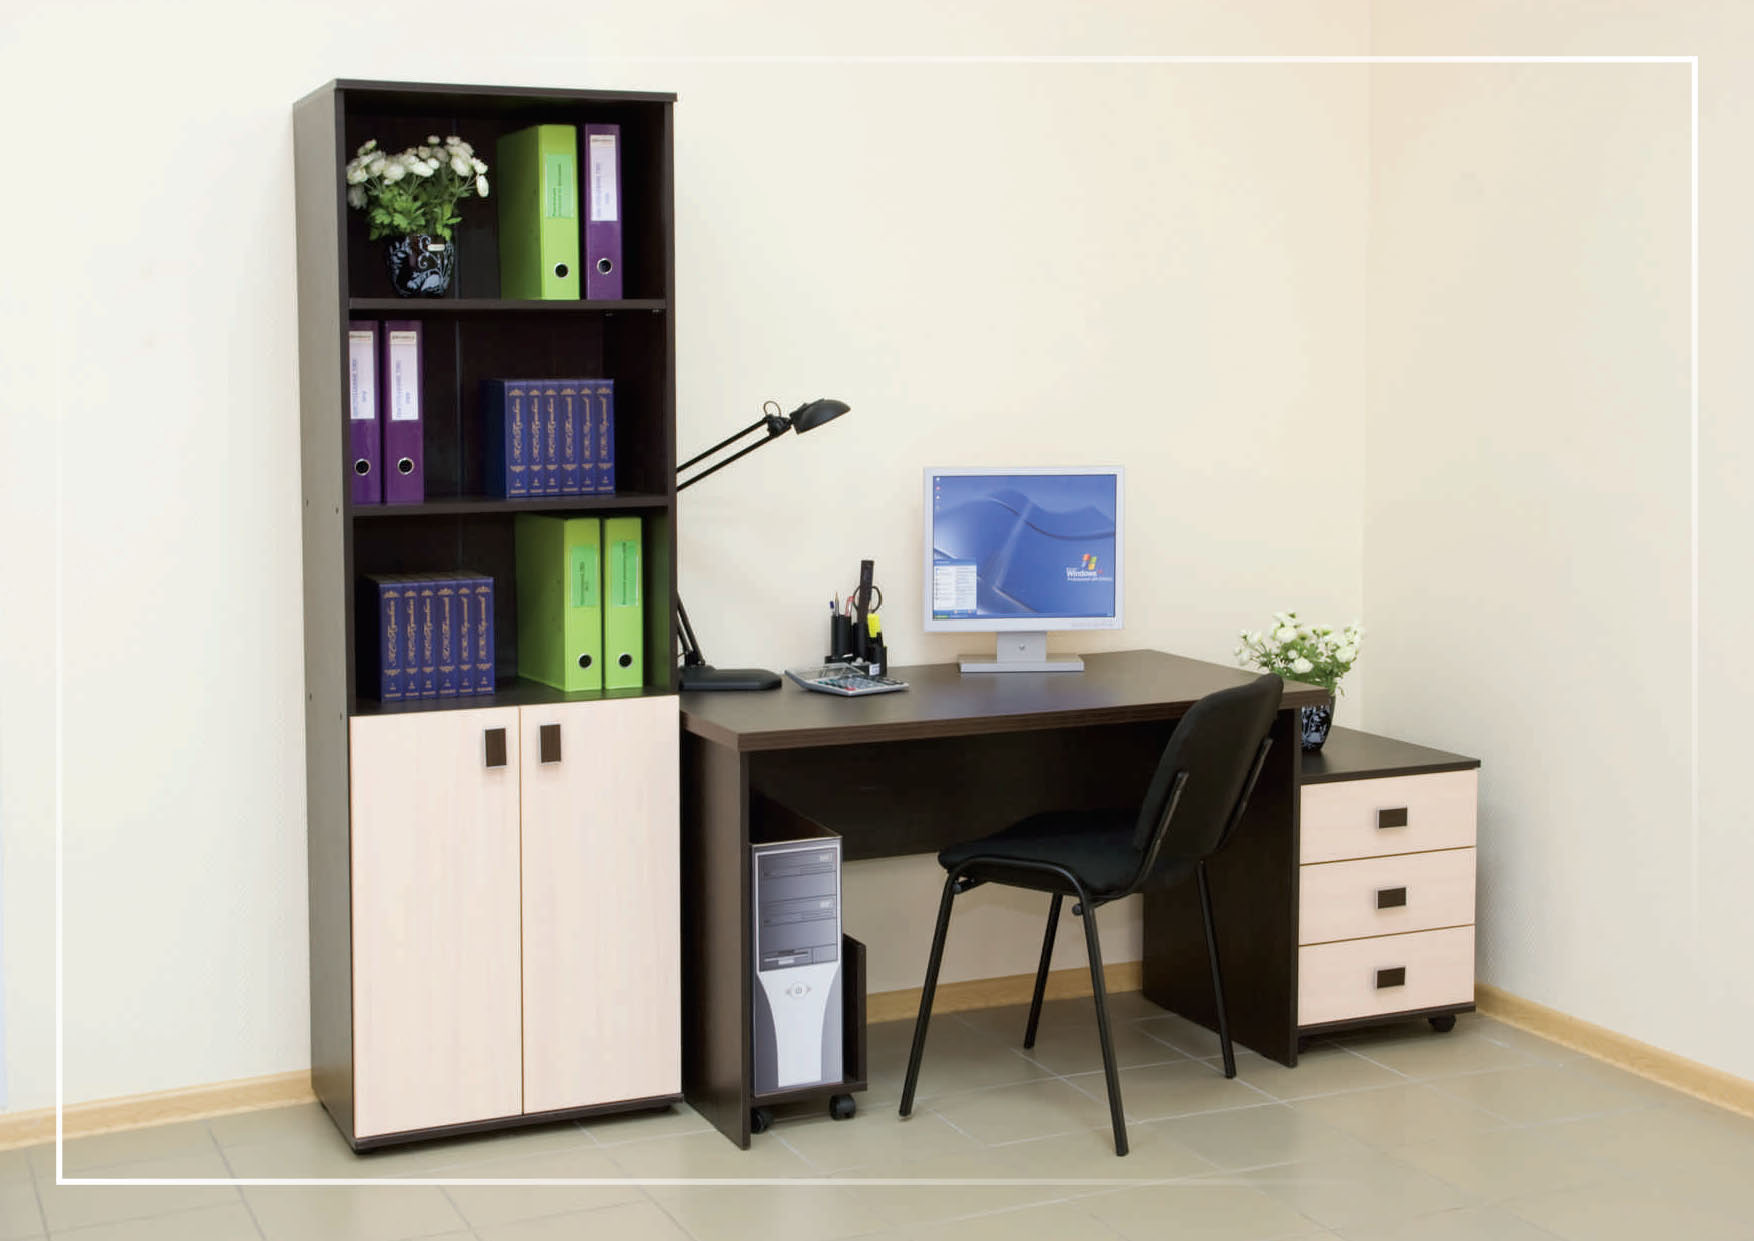 Компьютерный стол с тумбой: столики для компьютера и телевиз.